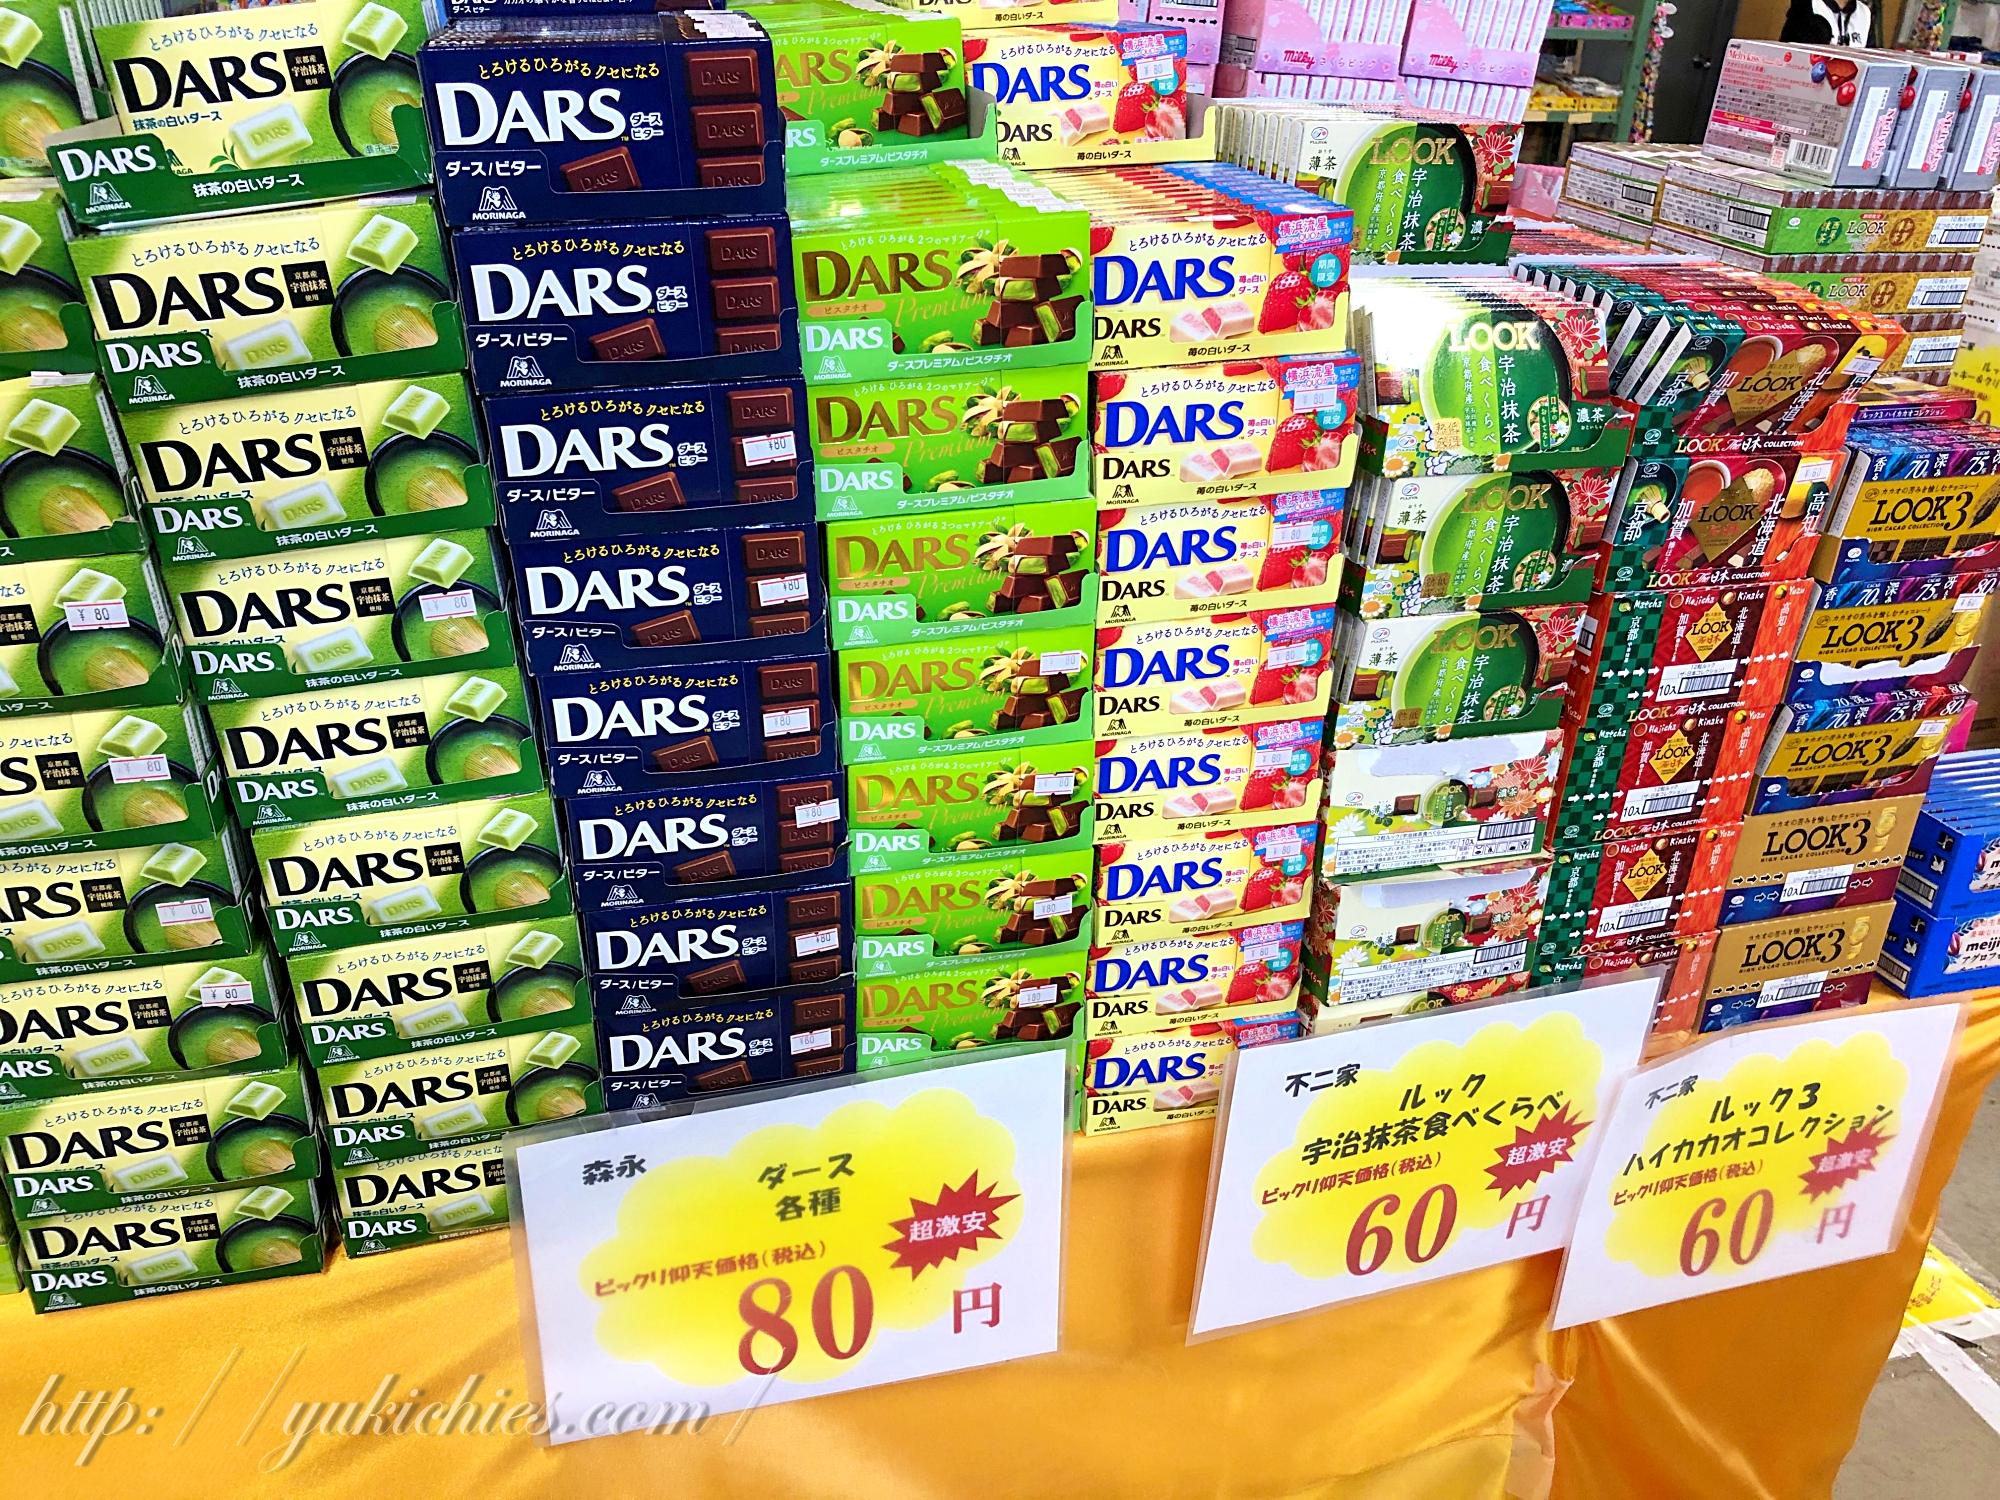 DARS 80円